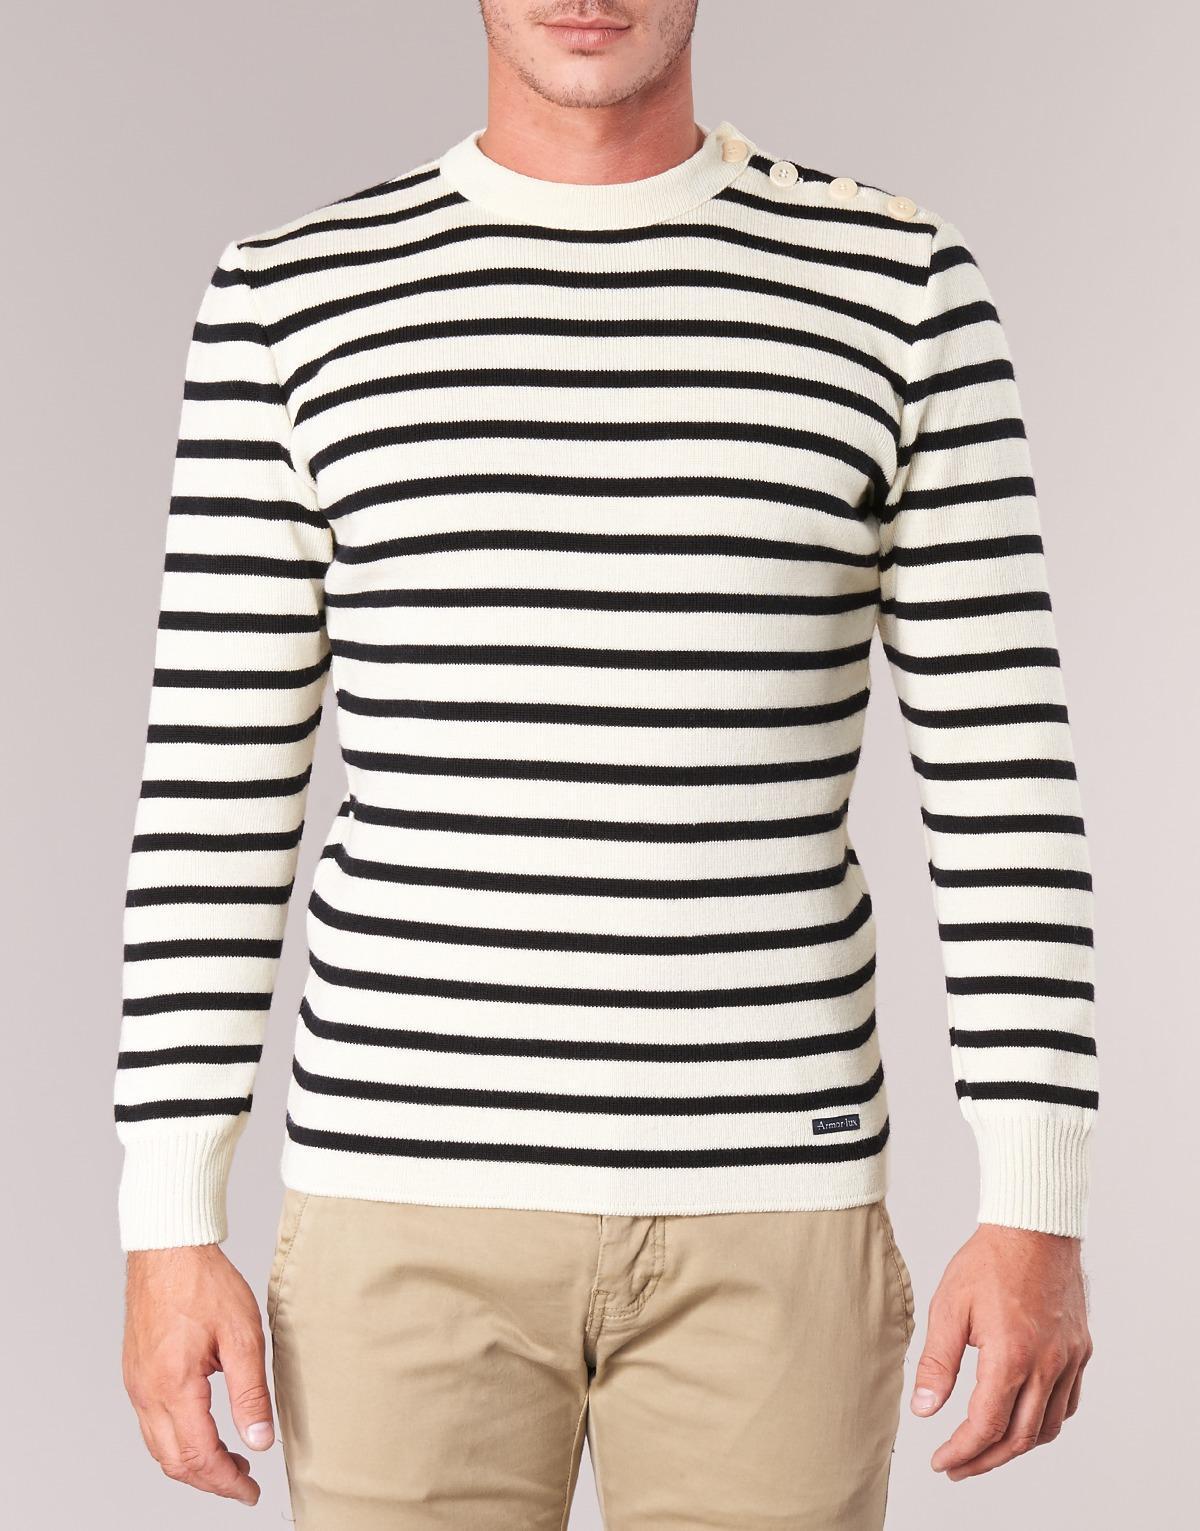 Armor Lux Groim Sweater in White for Men